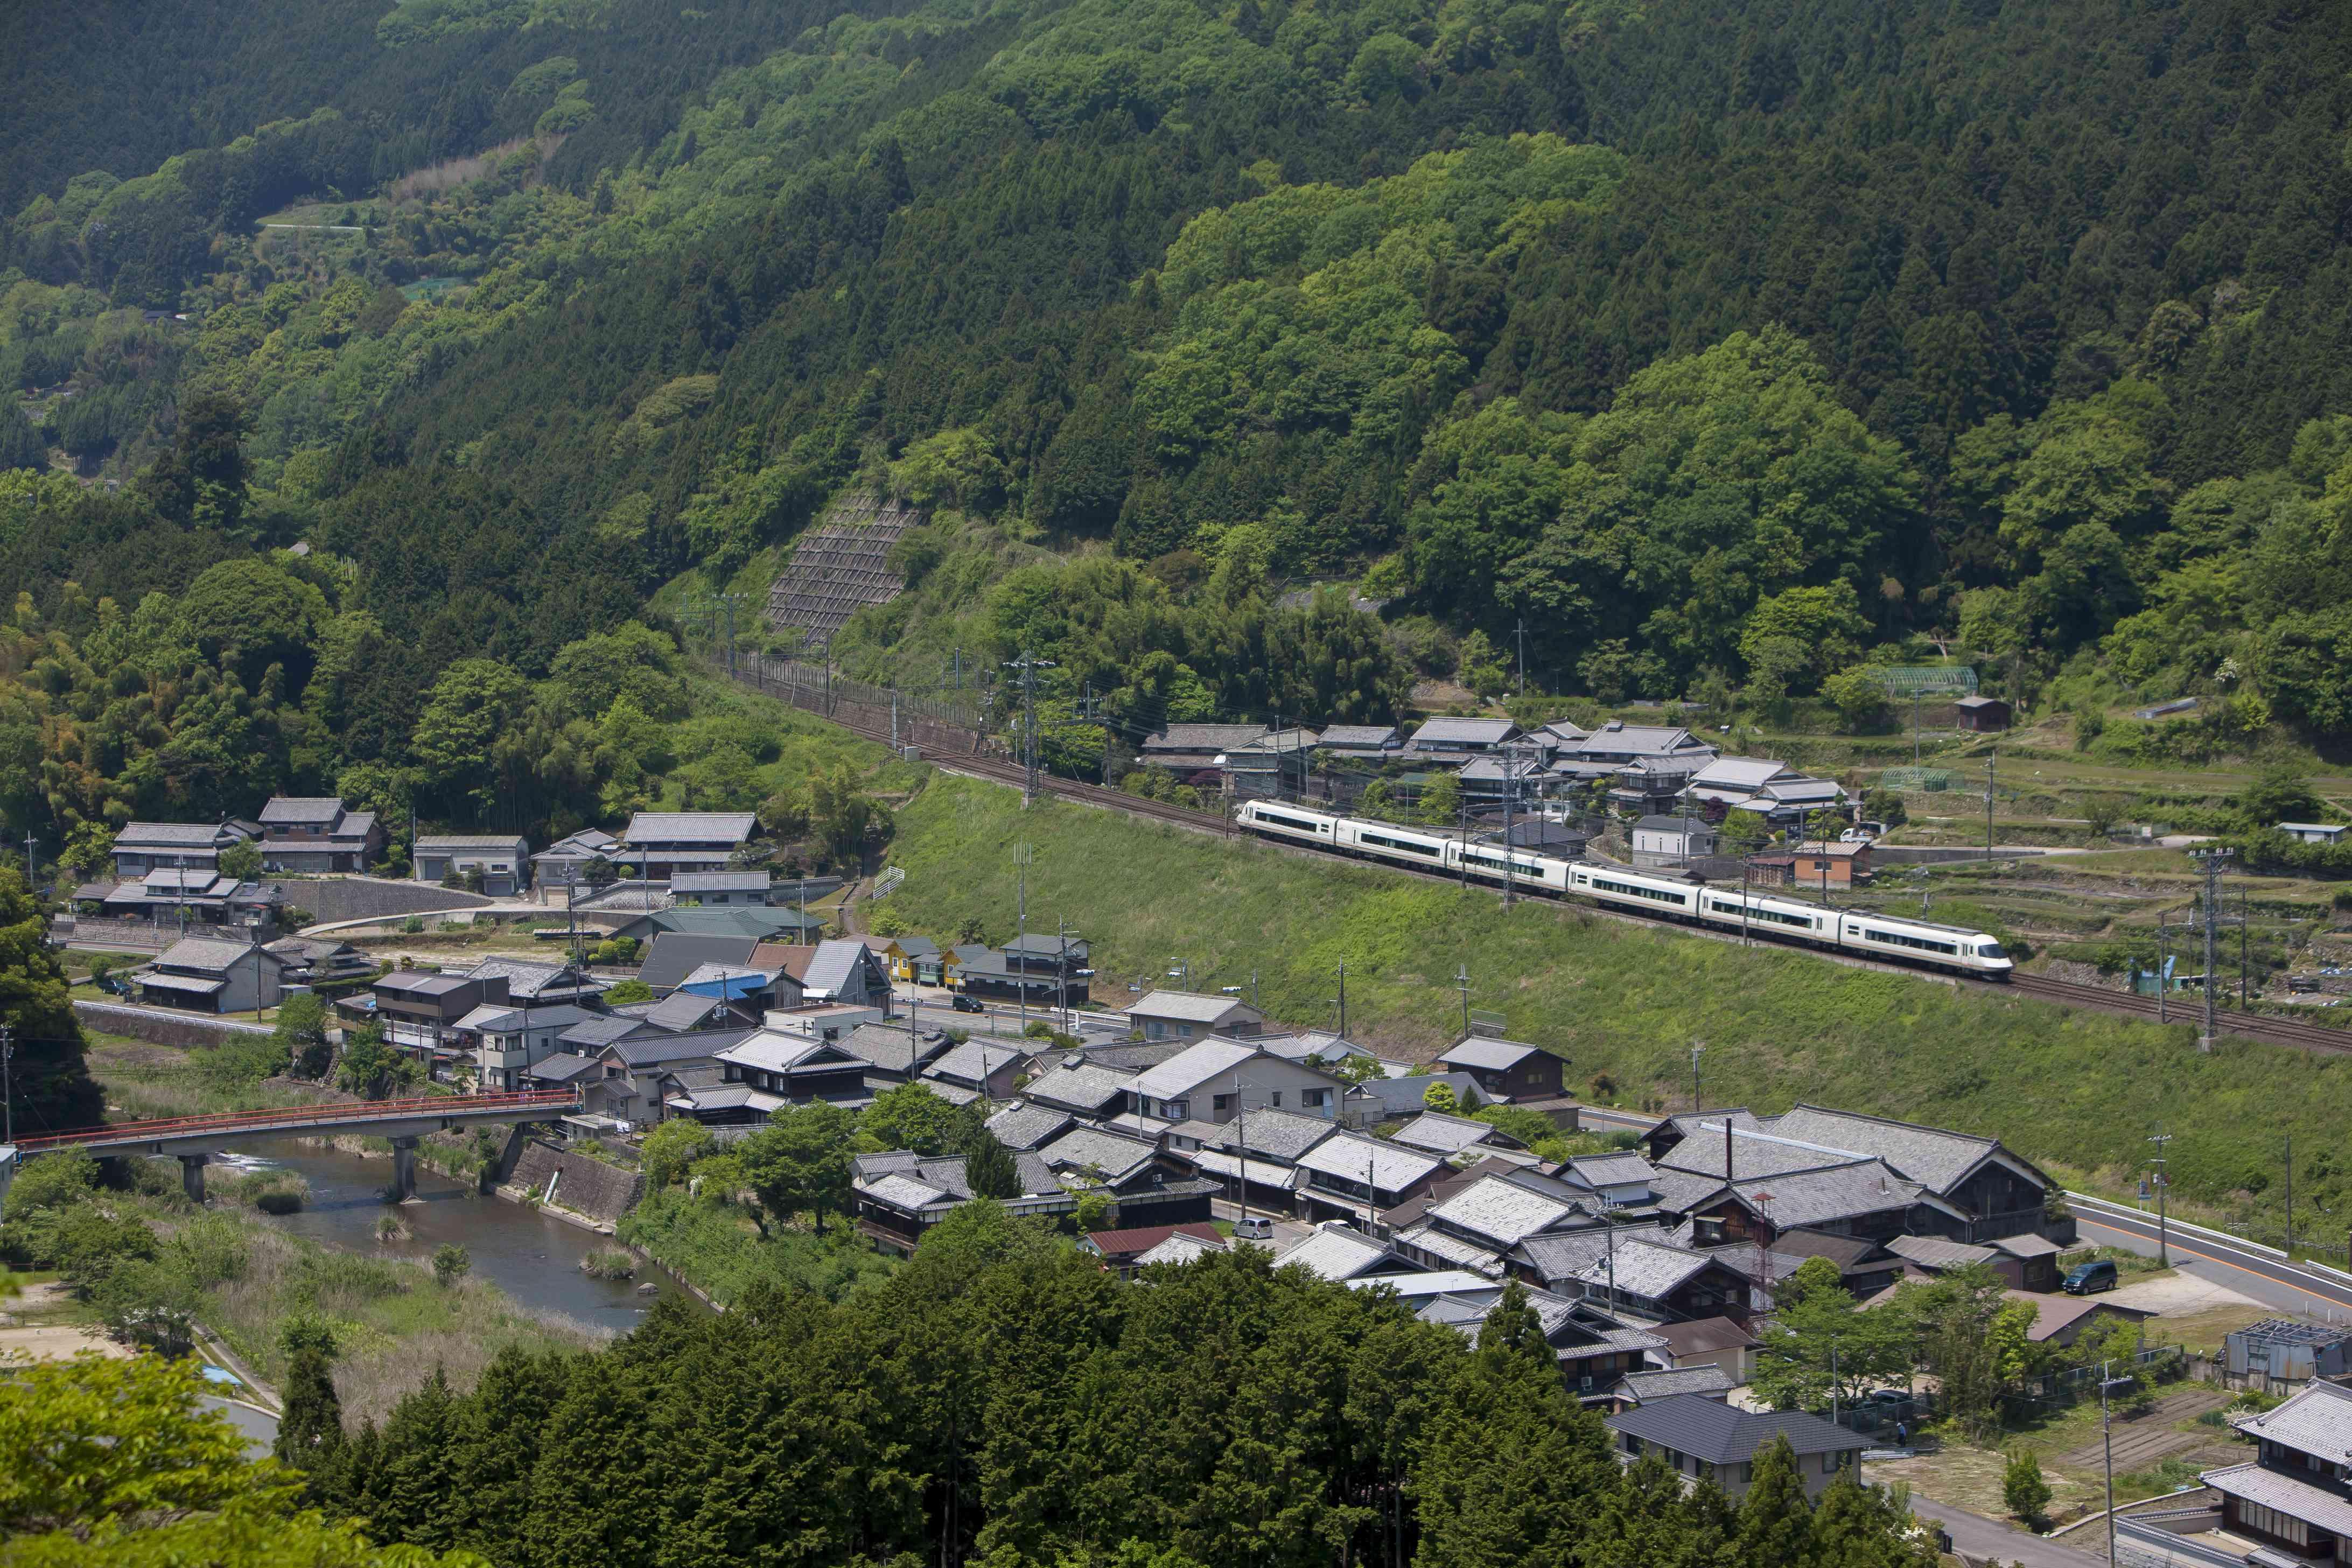 Kintetsu Limited Express train, Japan